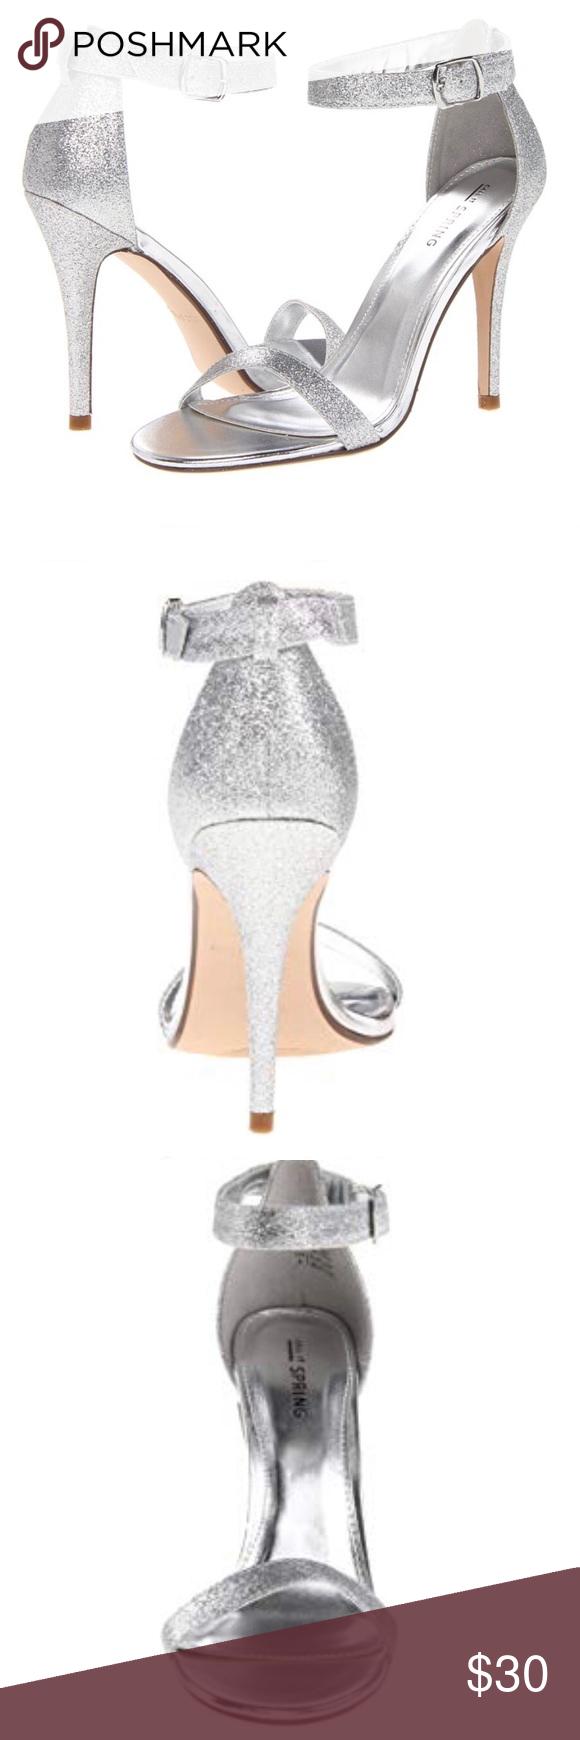 fc302ae9d9a Call It Spring Jechta Glitter Dress Heels-10 Call It Spring Women s Jechta  Glitter Dress